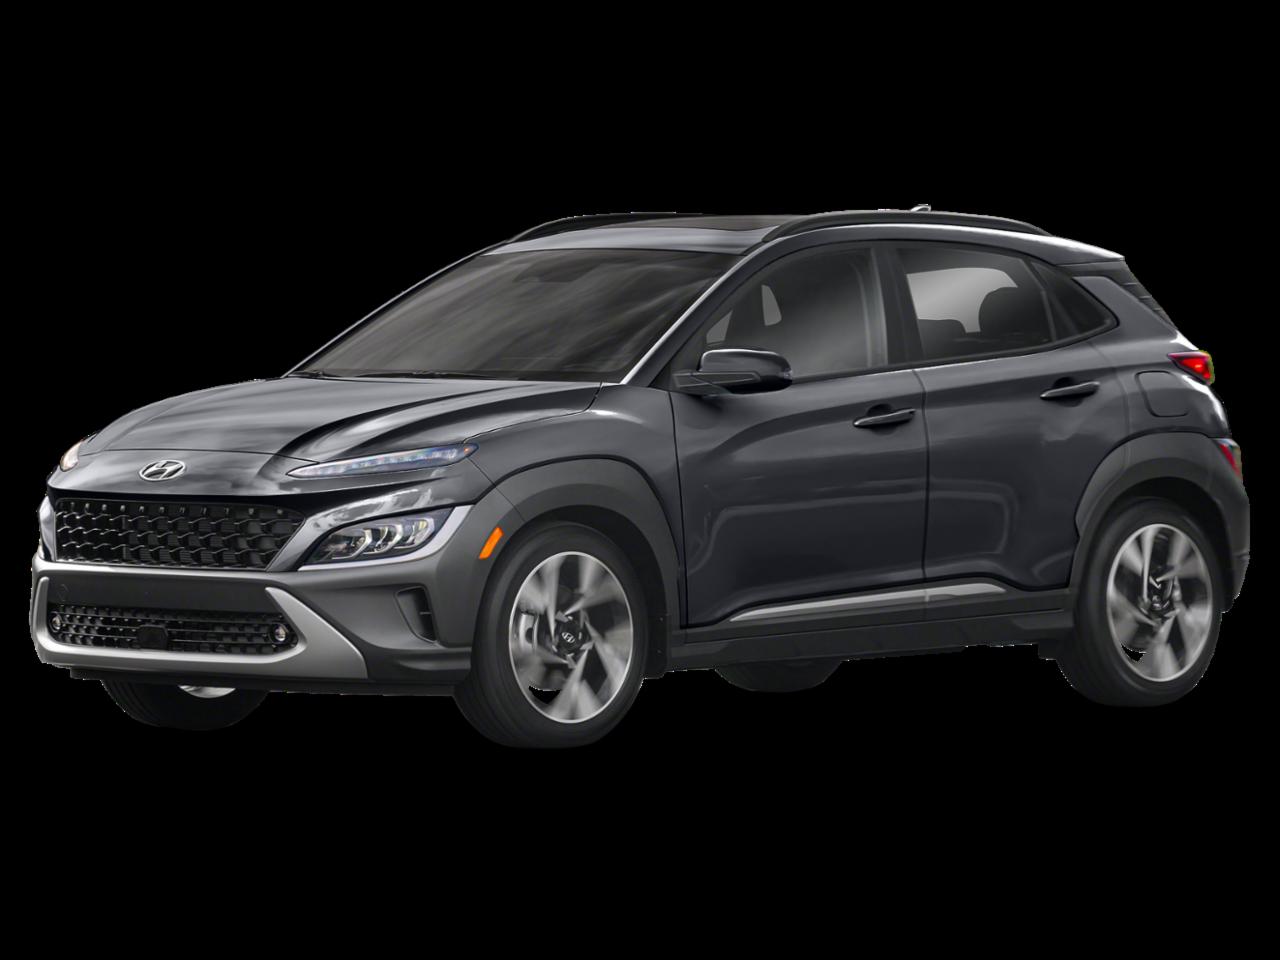 Hyundai 2022 Kona Limited